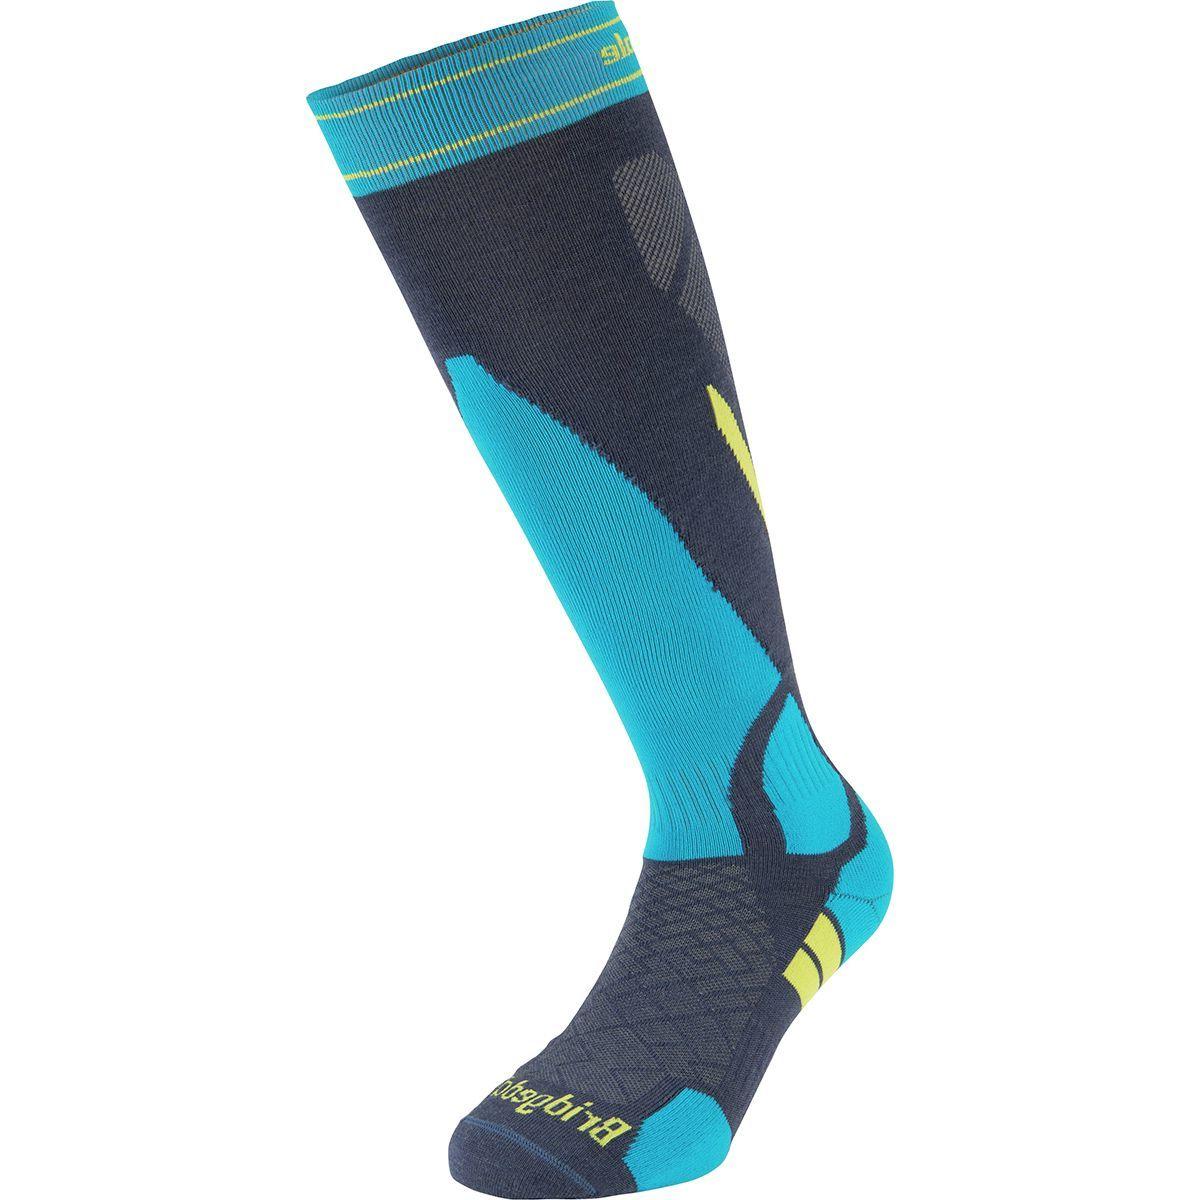 Bridgedale Ski Lightweight Merino Endurance Sock - Men's